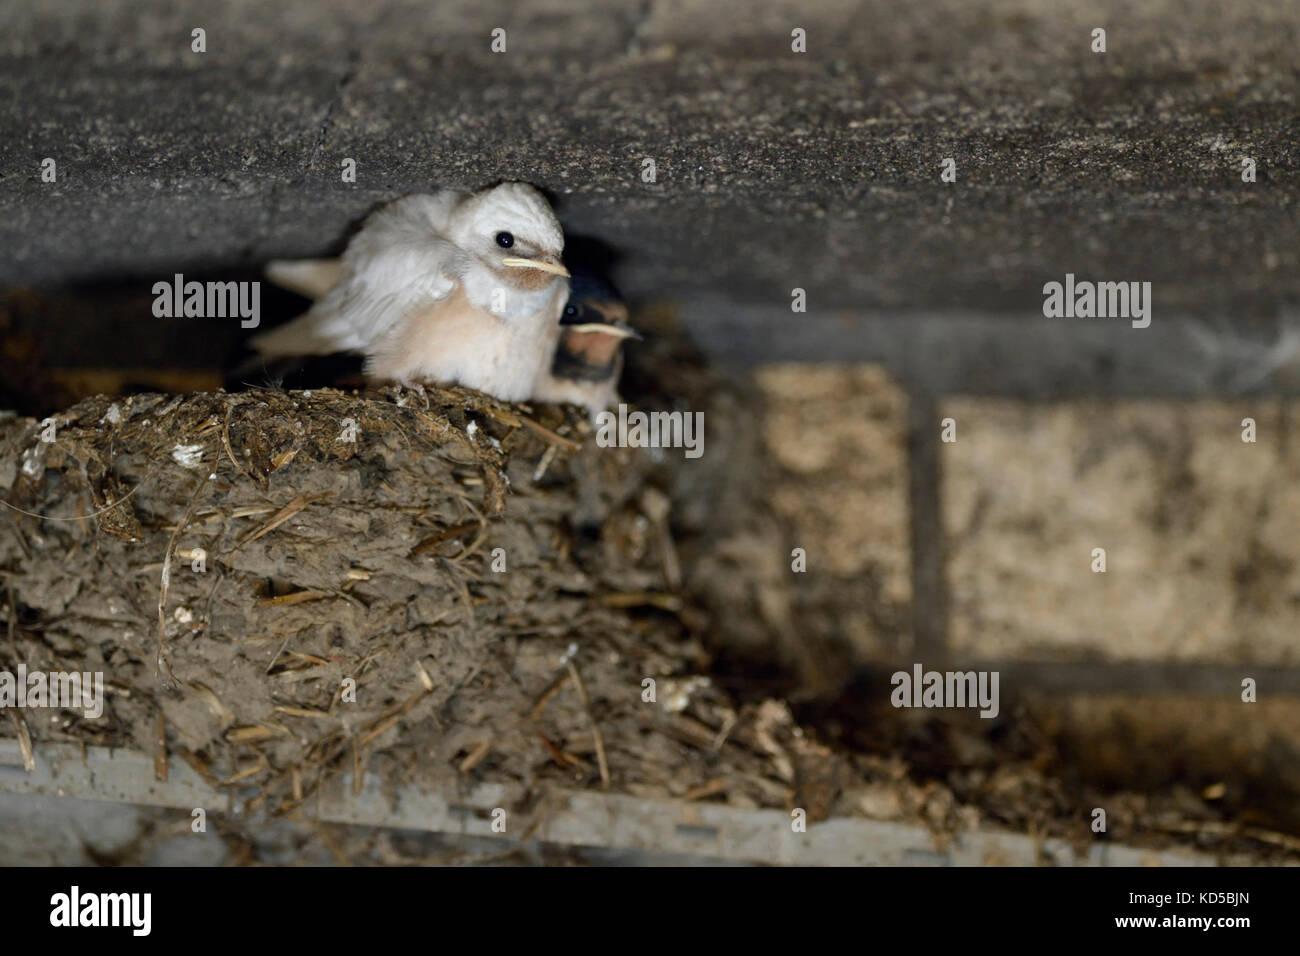 Barn Swallow / Rauchschwalbe ( Hirundo rustica ), chicks in nest, almost fledged, one with white plumage, rare gene - Stock Image